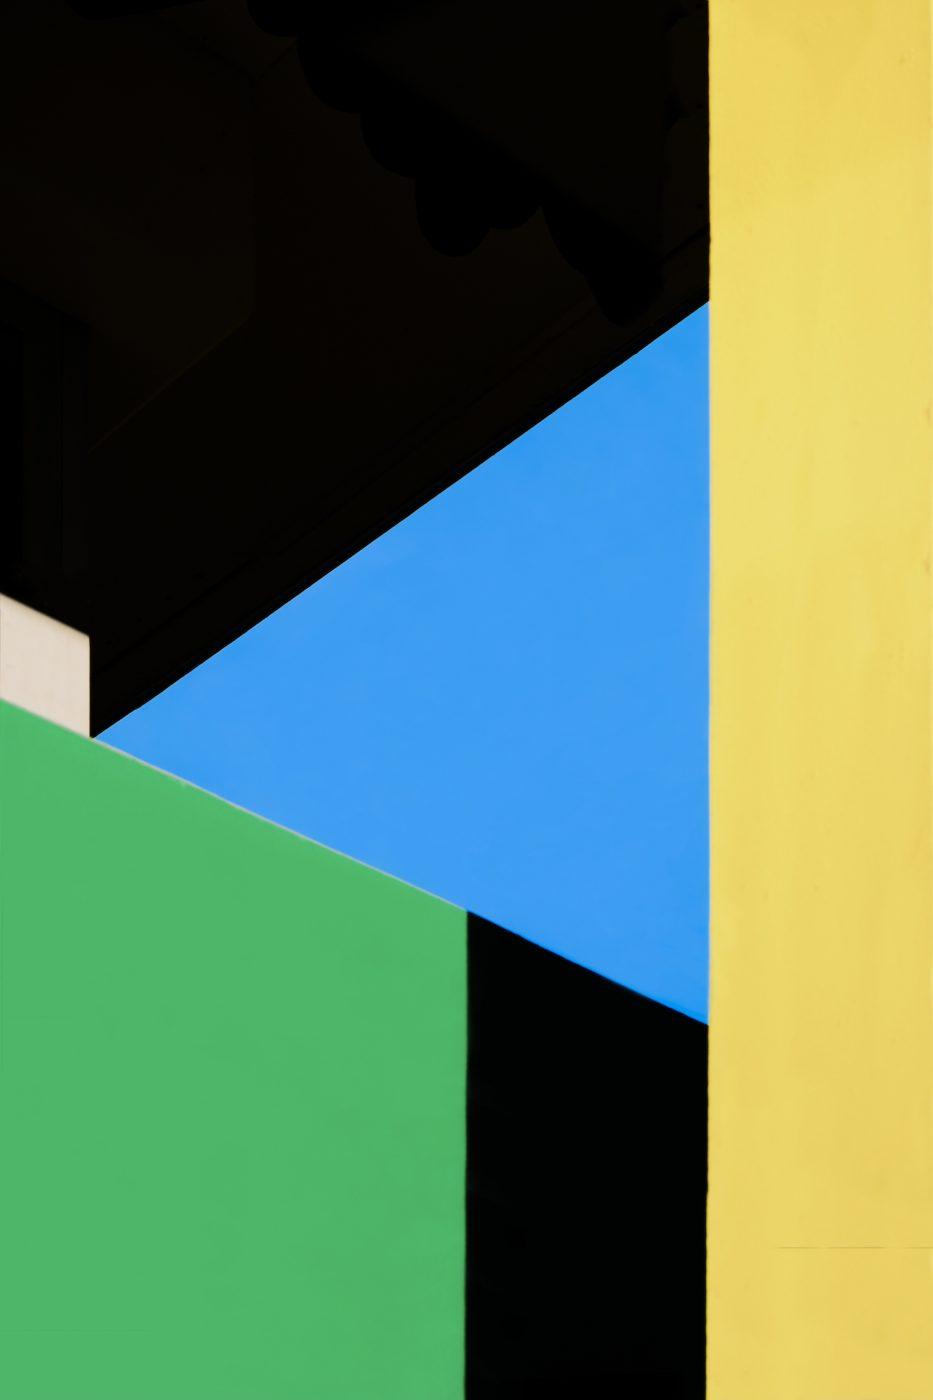 Guido Klumpe - Loosing One Dimension _P_12 2